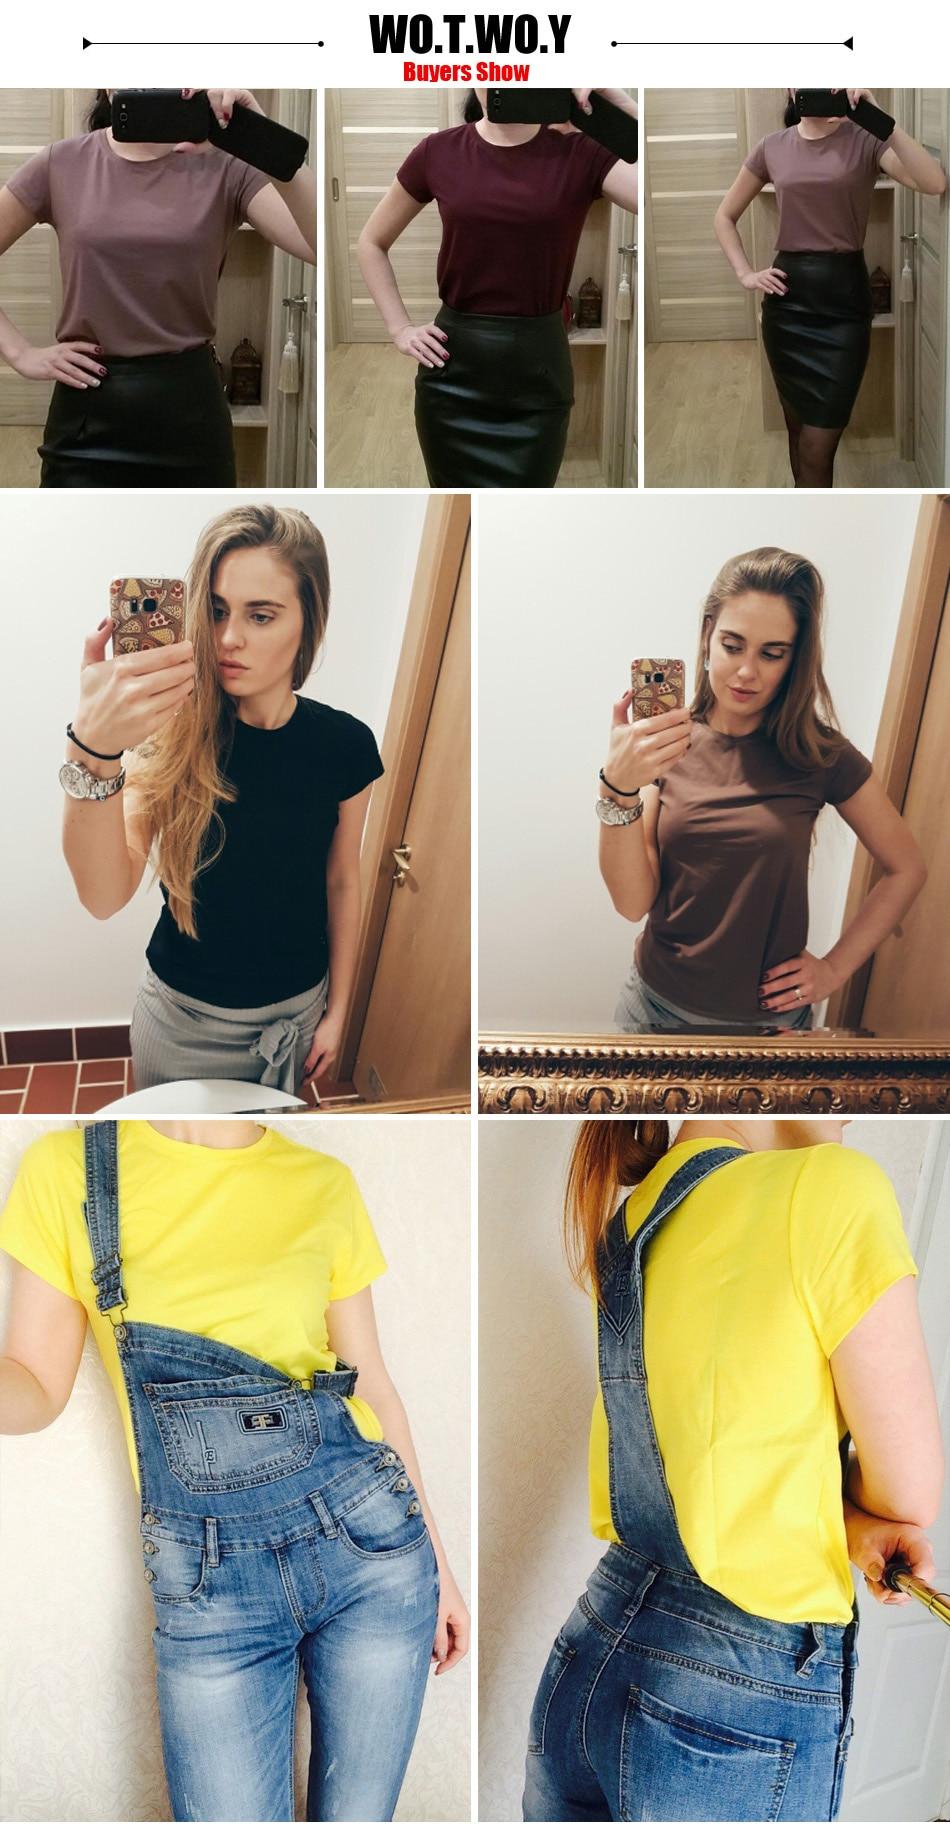 HTB1Jl0vRFXXXXXQXXXXq6xXFXXX7 - High Quality Plain T Shirt Women Cotton Elastic Basic T-shirts